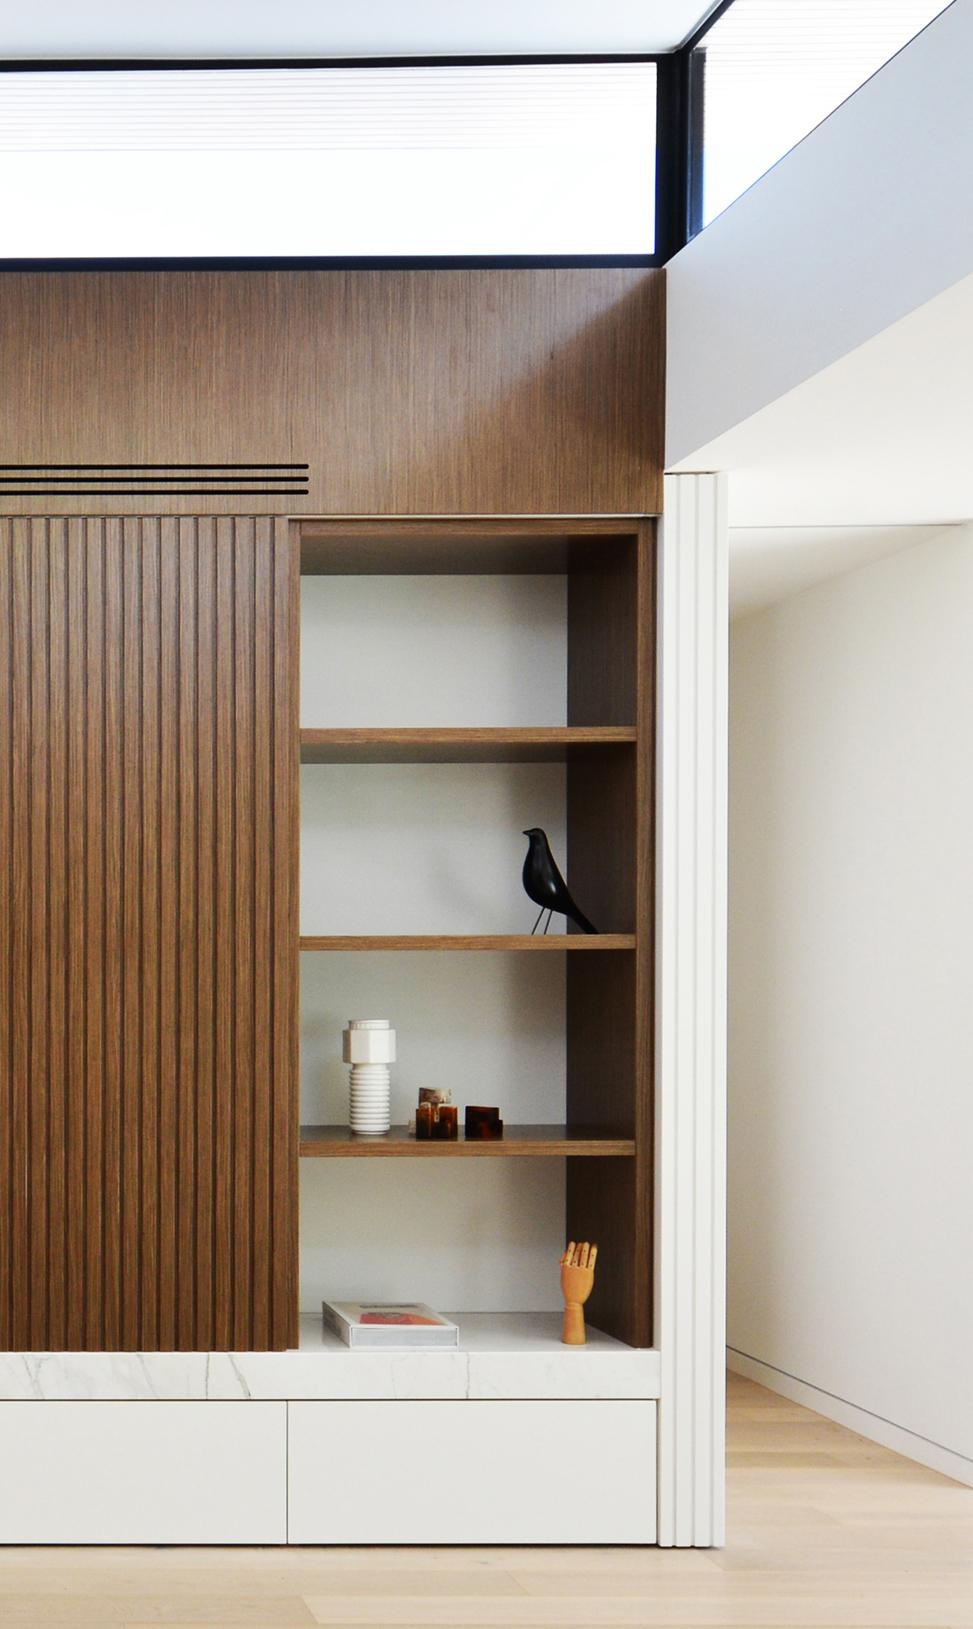 Mid Century Modern-Tecture-The Local Project-Australian Architecture & Design-Image 6